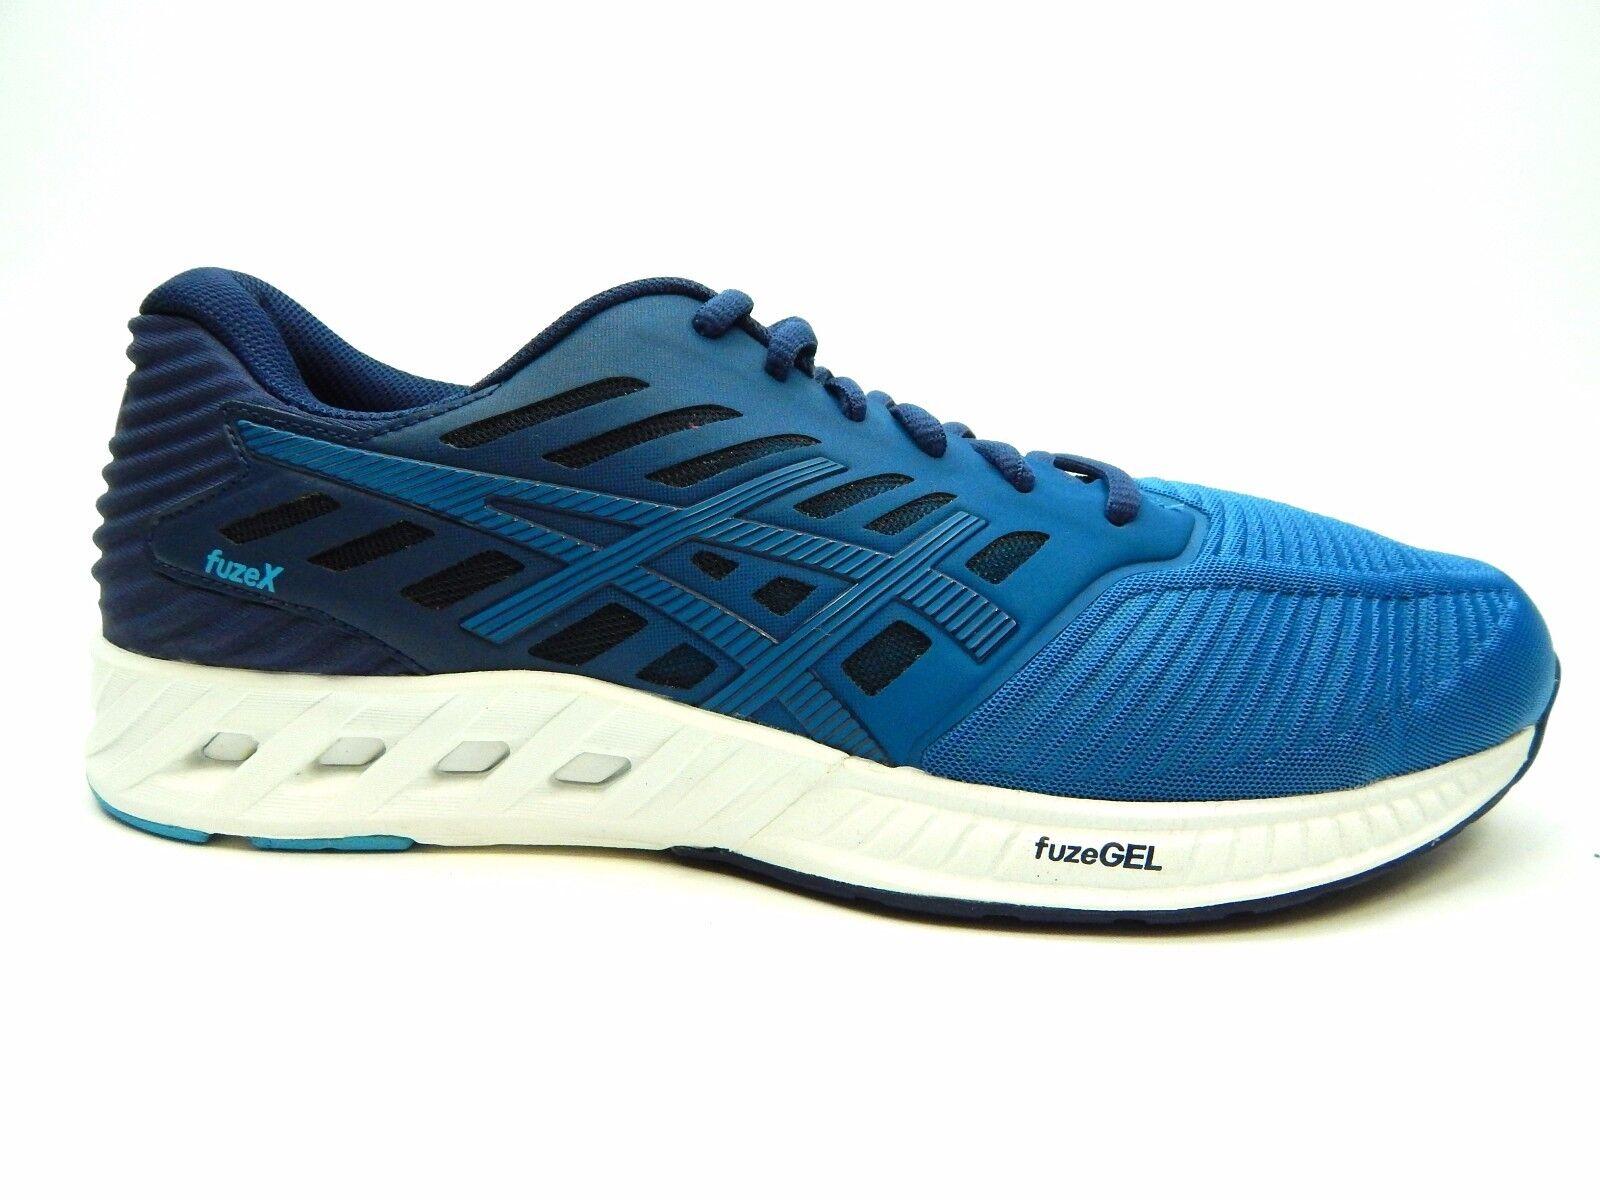 Le indaco fuzex t639n 4949 blu indaco Le tuono blu uomini scarpe numero 15 eaa23d